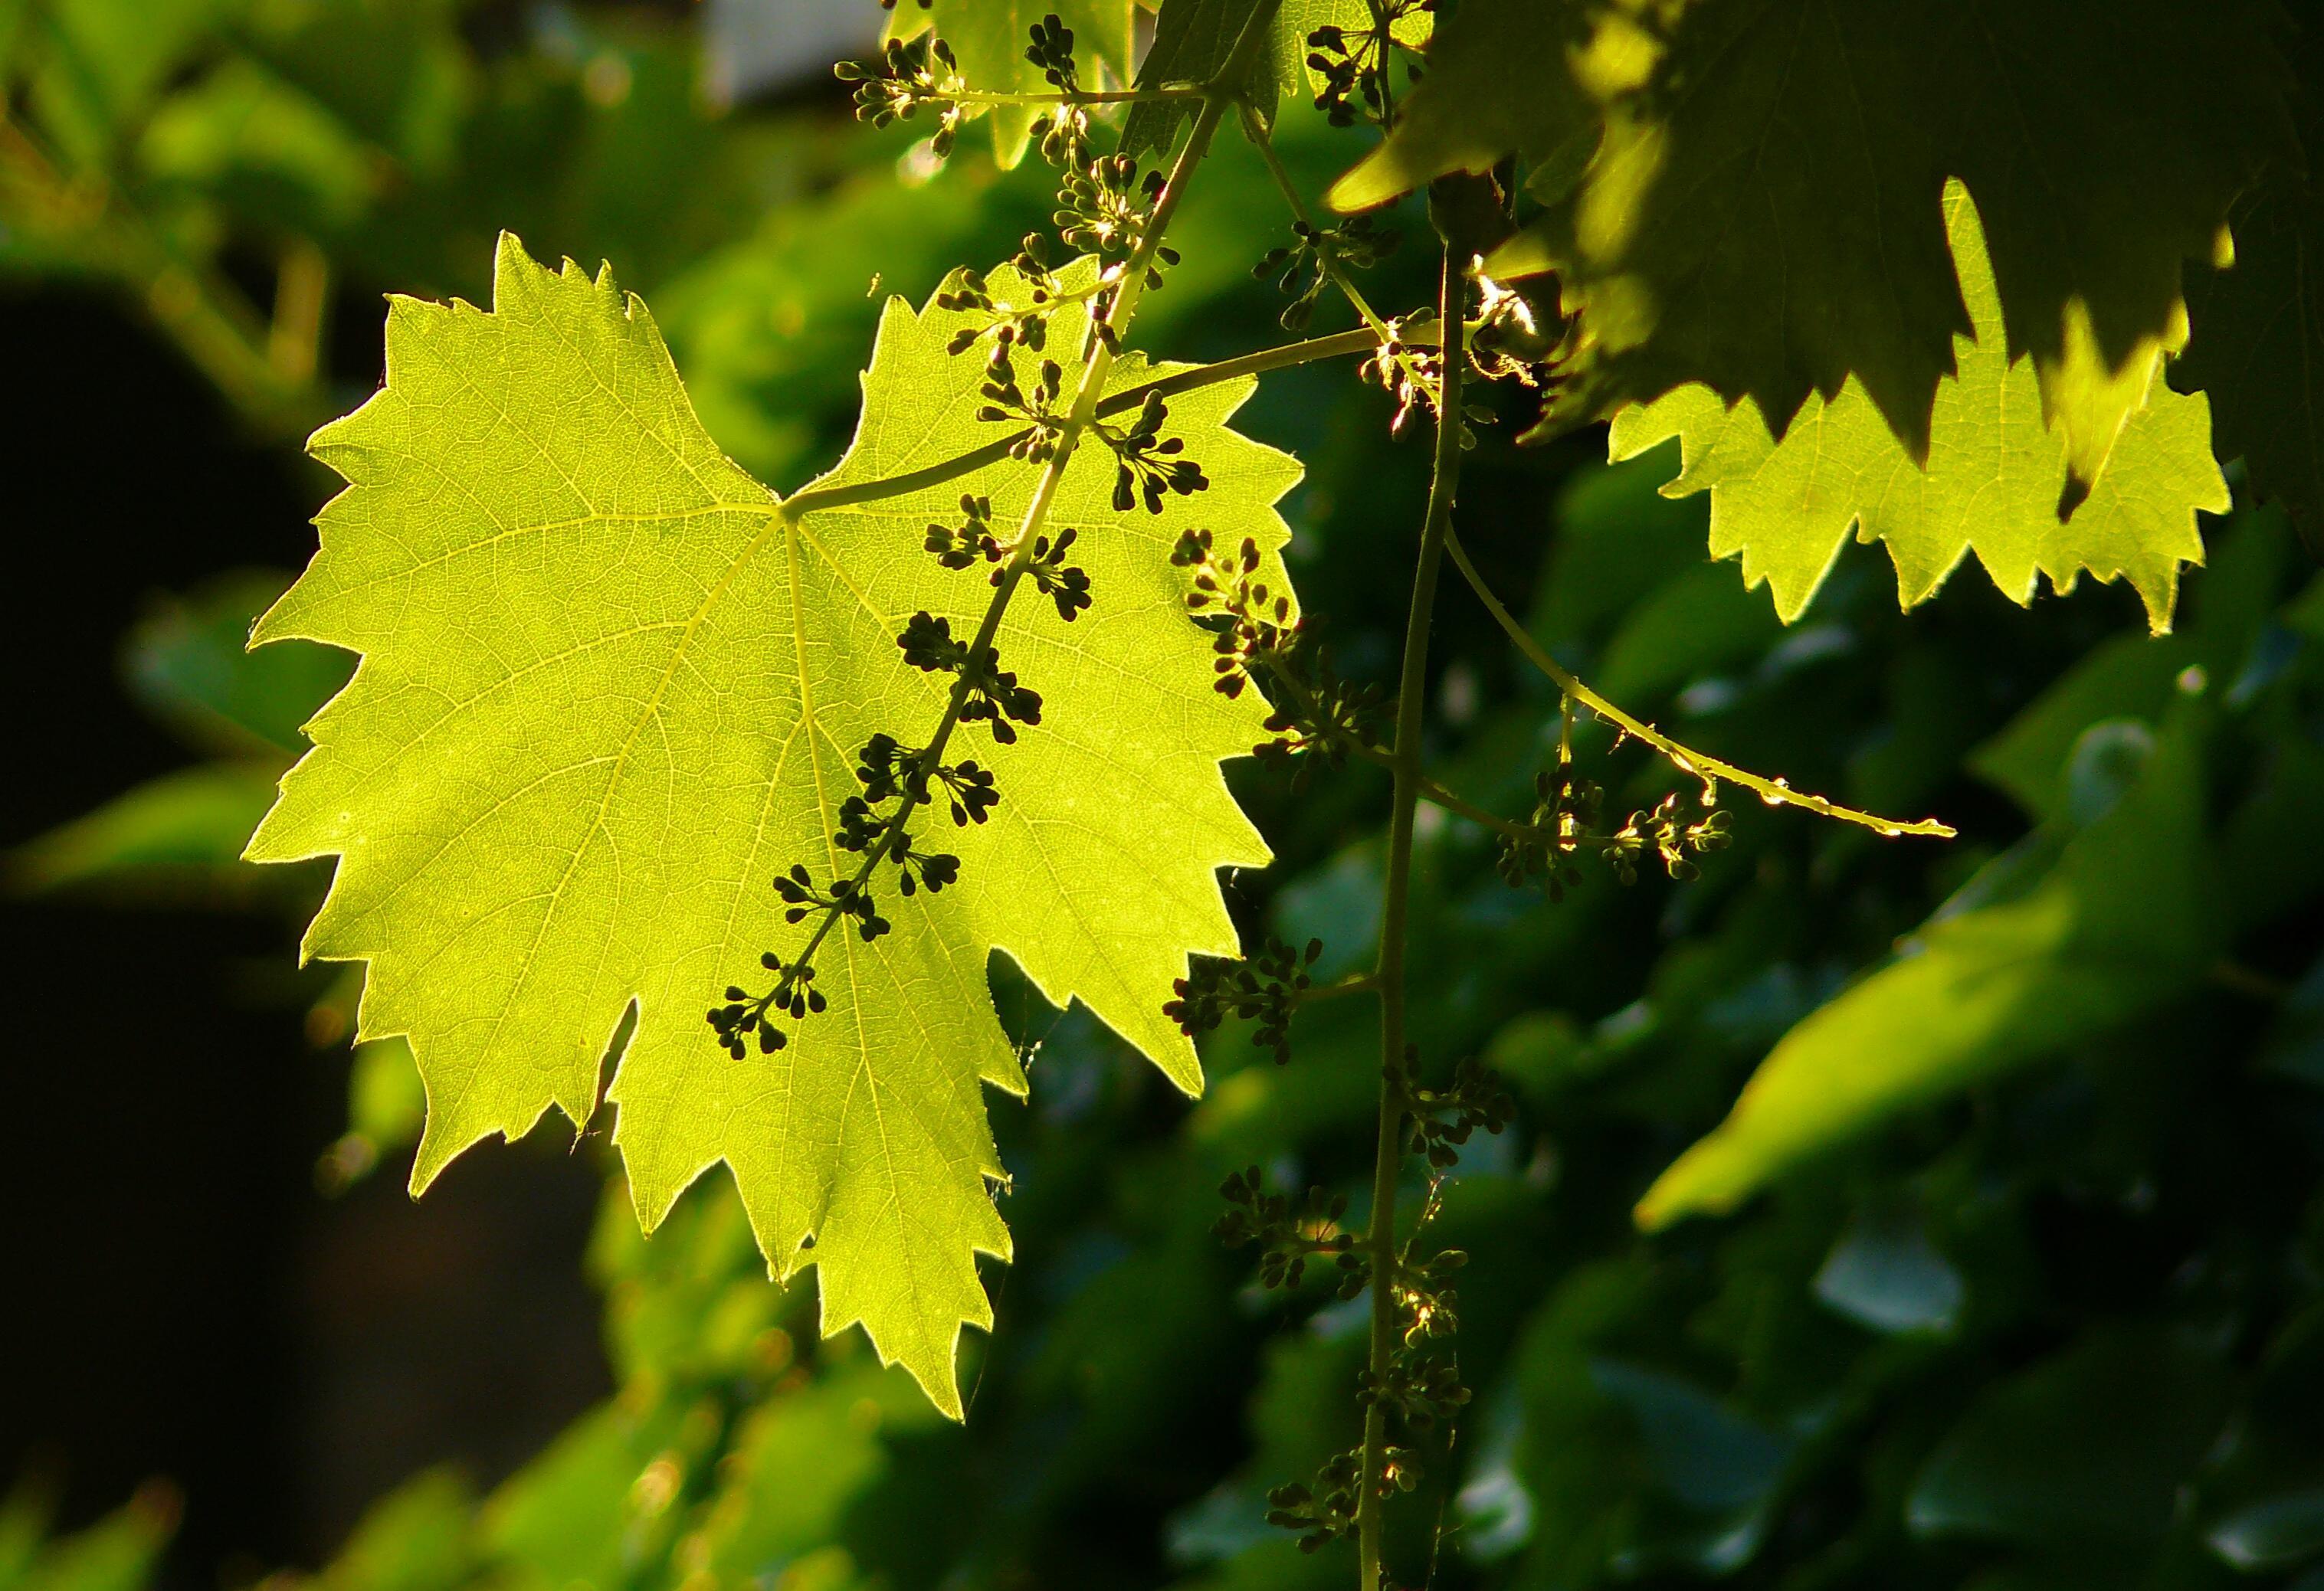 Free Images Nature Branch Blossom Vine Wine Sunlight Leaf